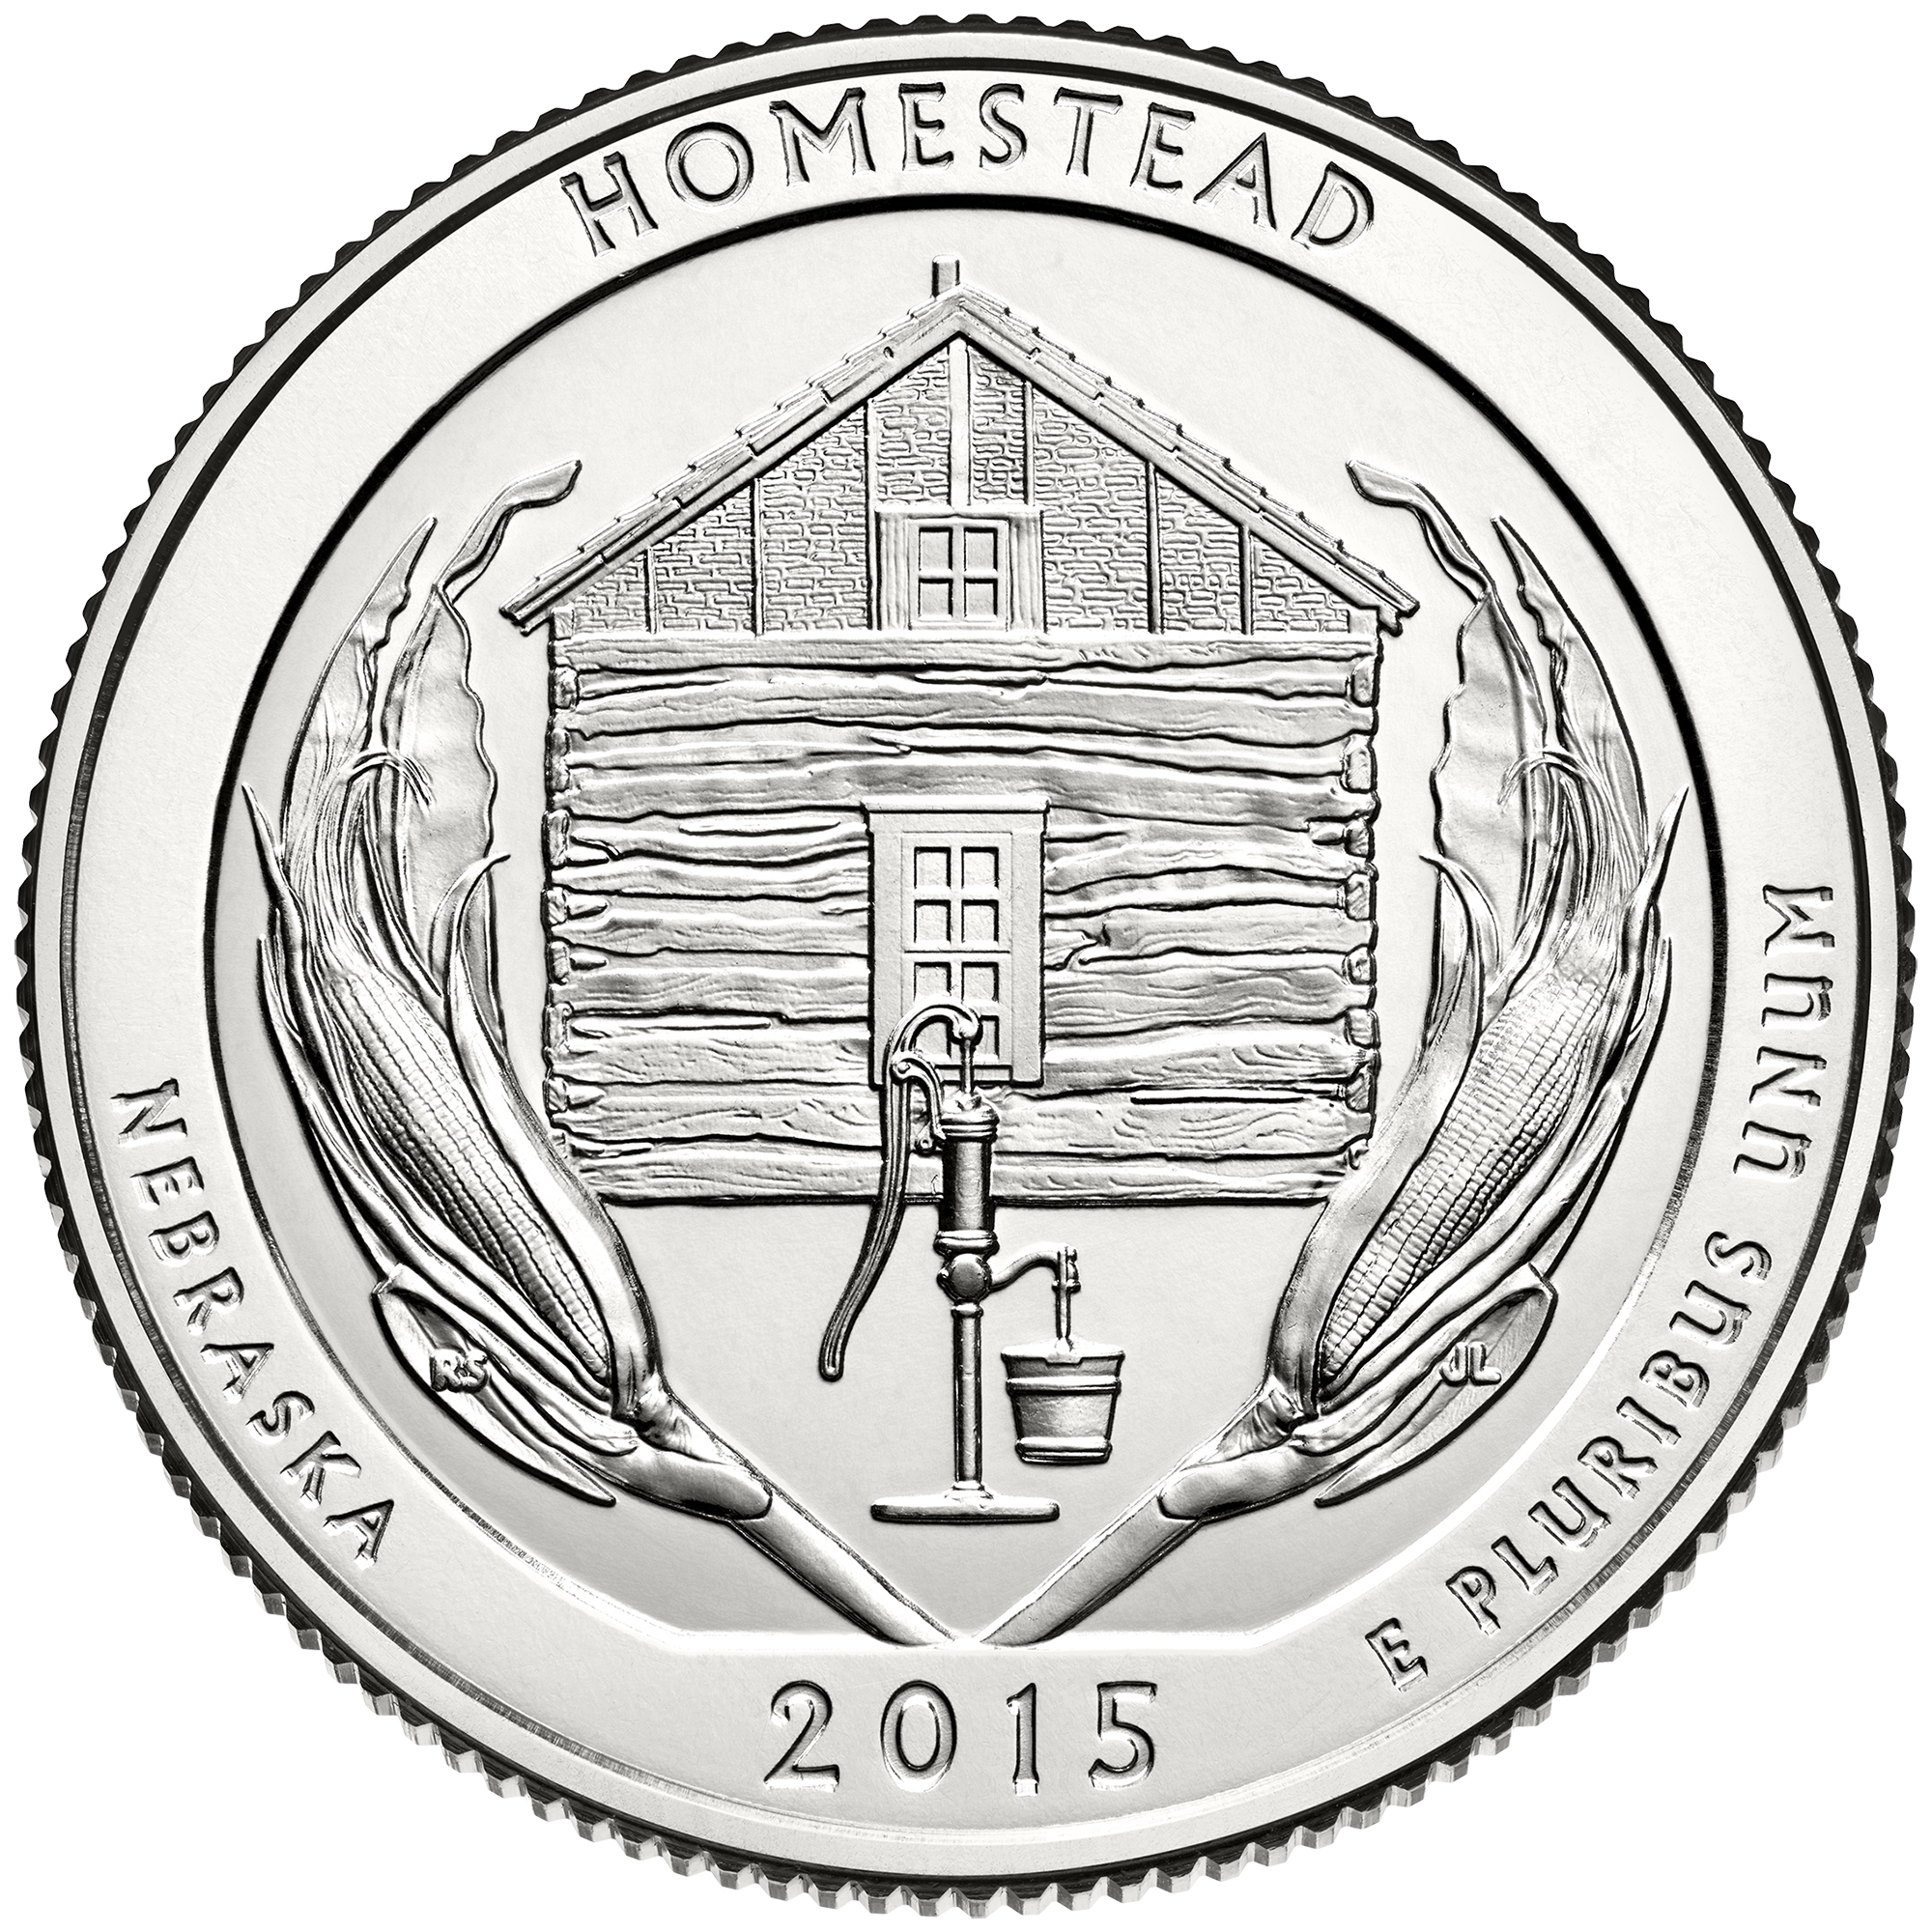 2015 America The Beautiful Quarters Coin Homestead Nebraska Uncirculated Reverse